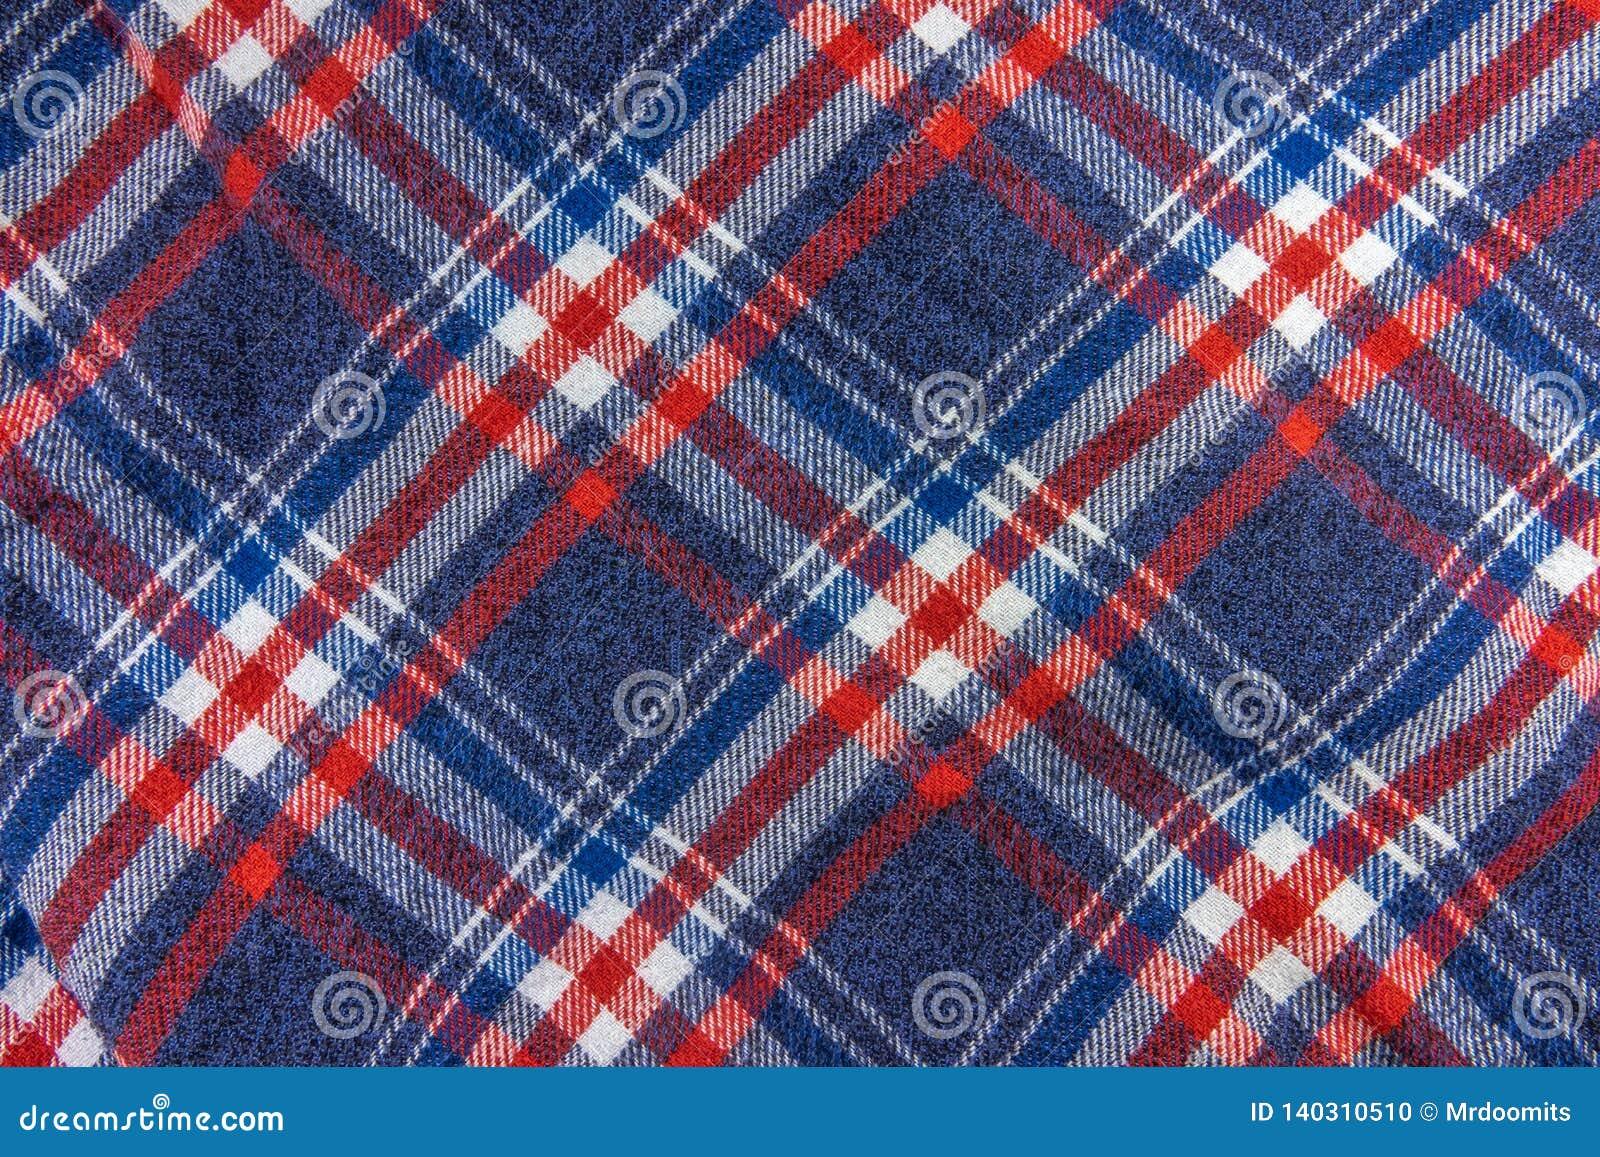 Hipster Plaid Shirt Pattern